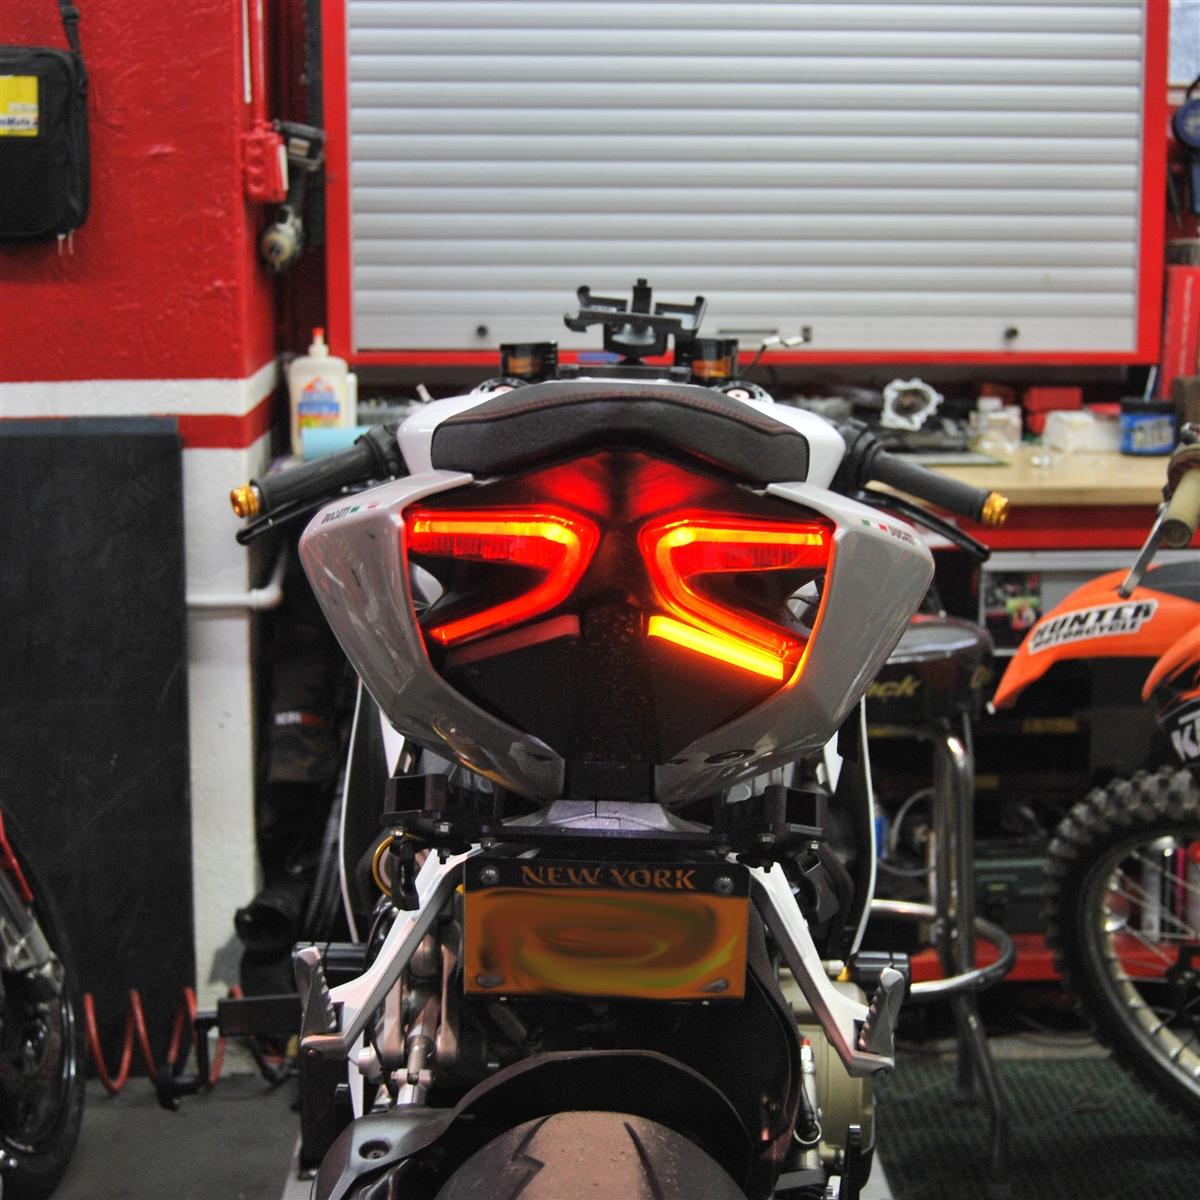 Ducati Panigale Fender Eliminator Nrc